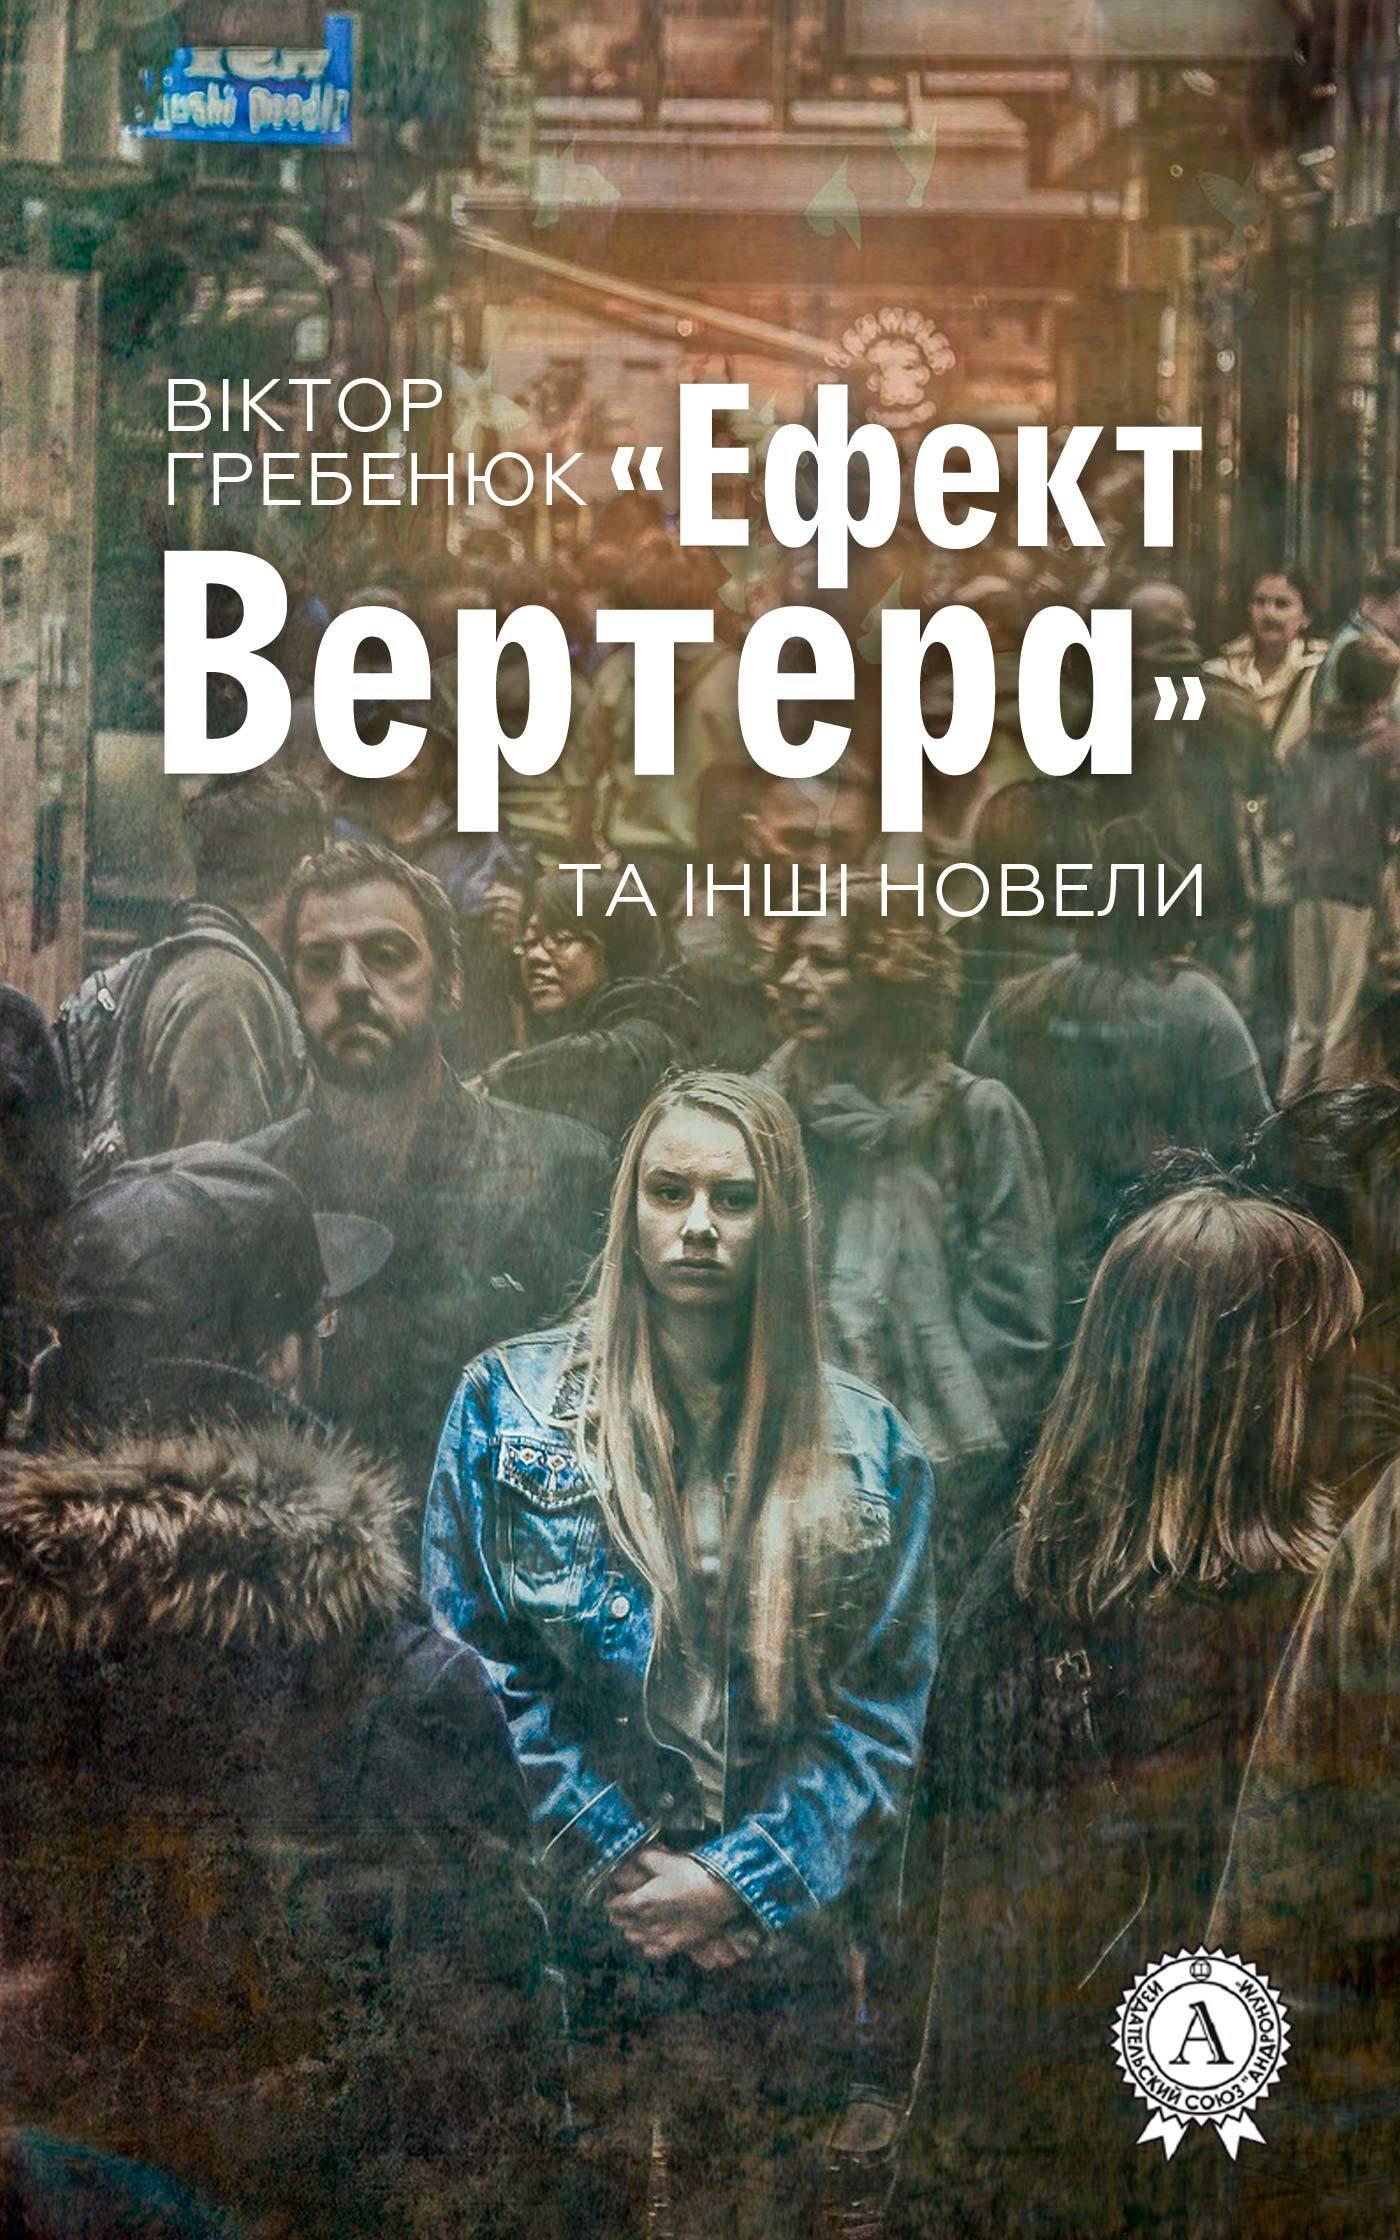 Віктор Гребенюк «Ефект Вертера» та інші новели ISBN: 978-1-387-65969-2 натт харрис бомбермэн isbn 978 1 387 70396 8